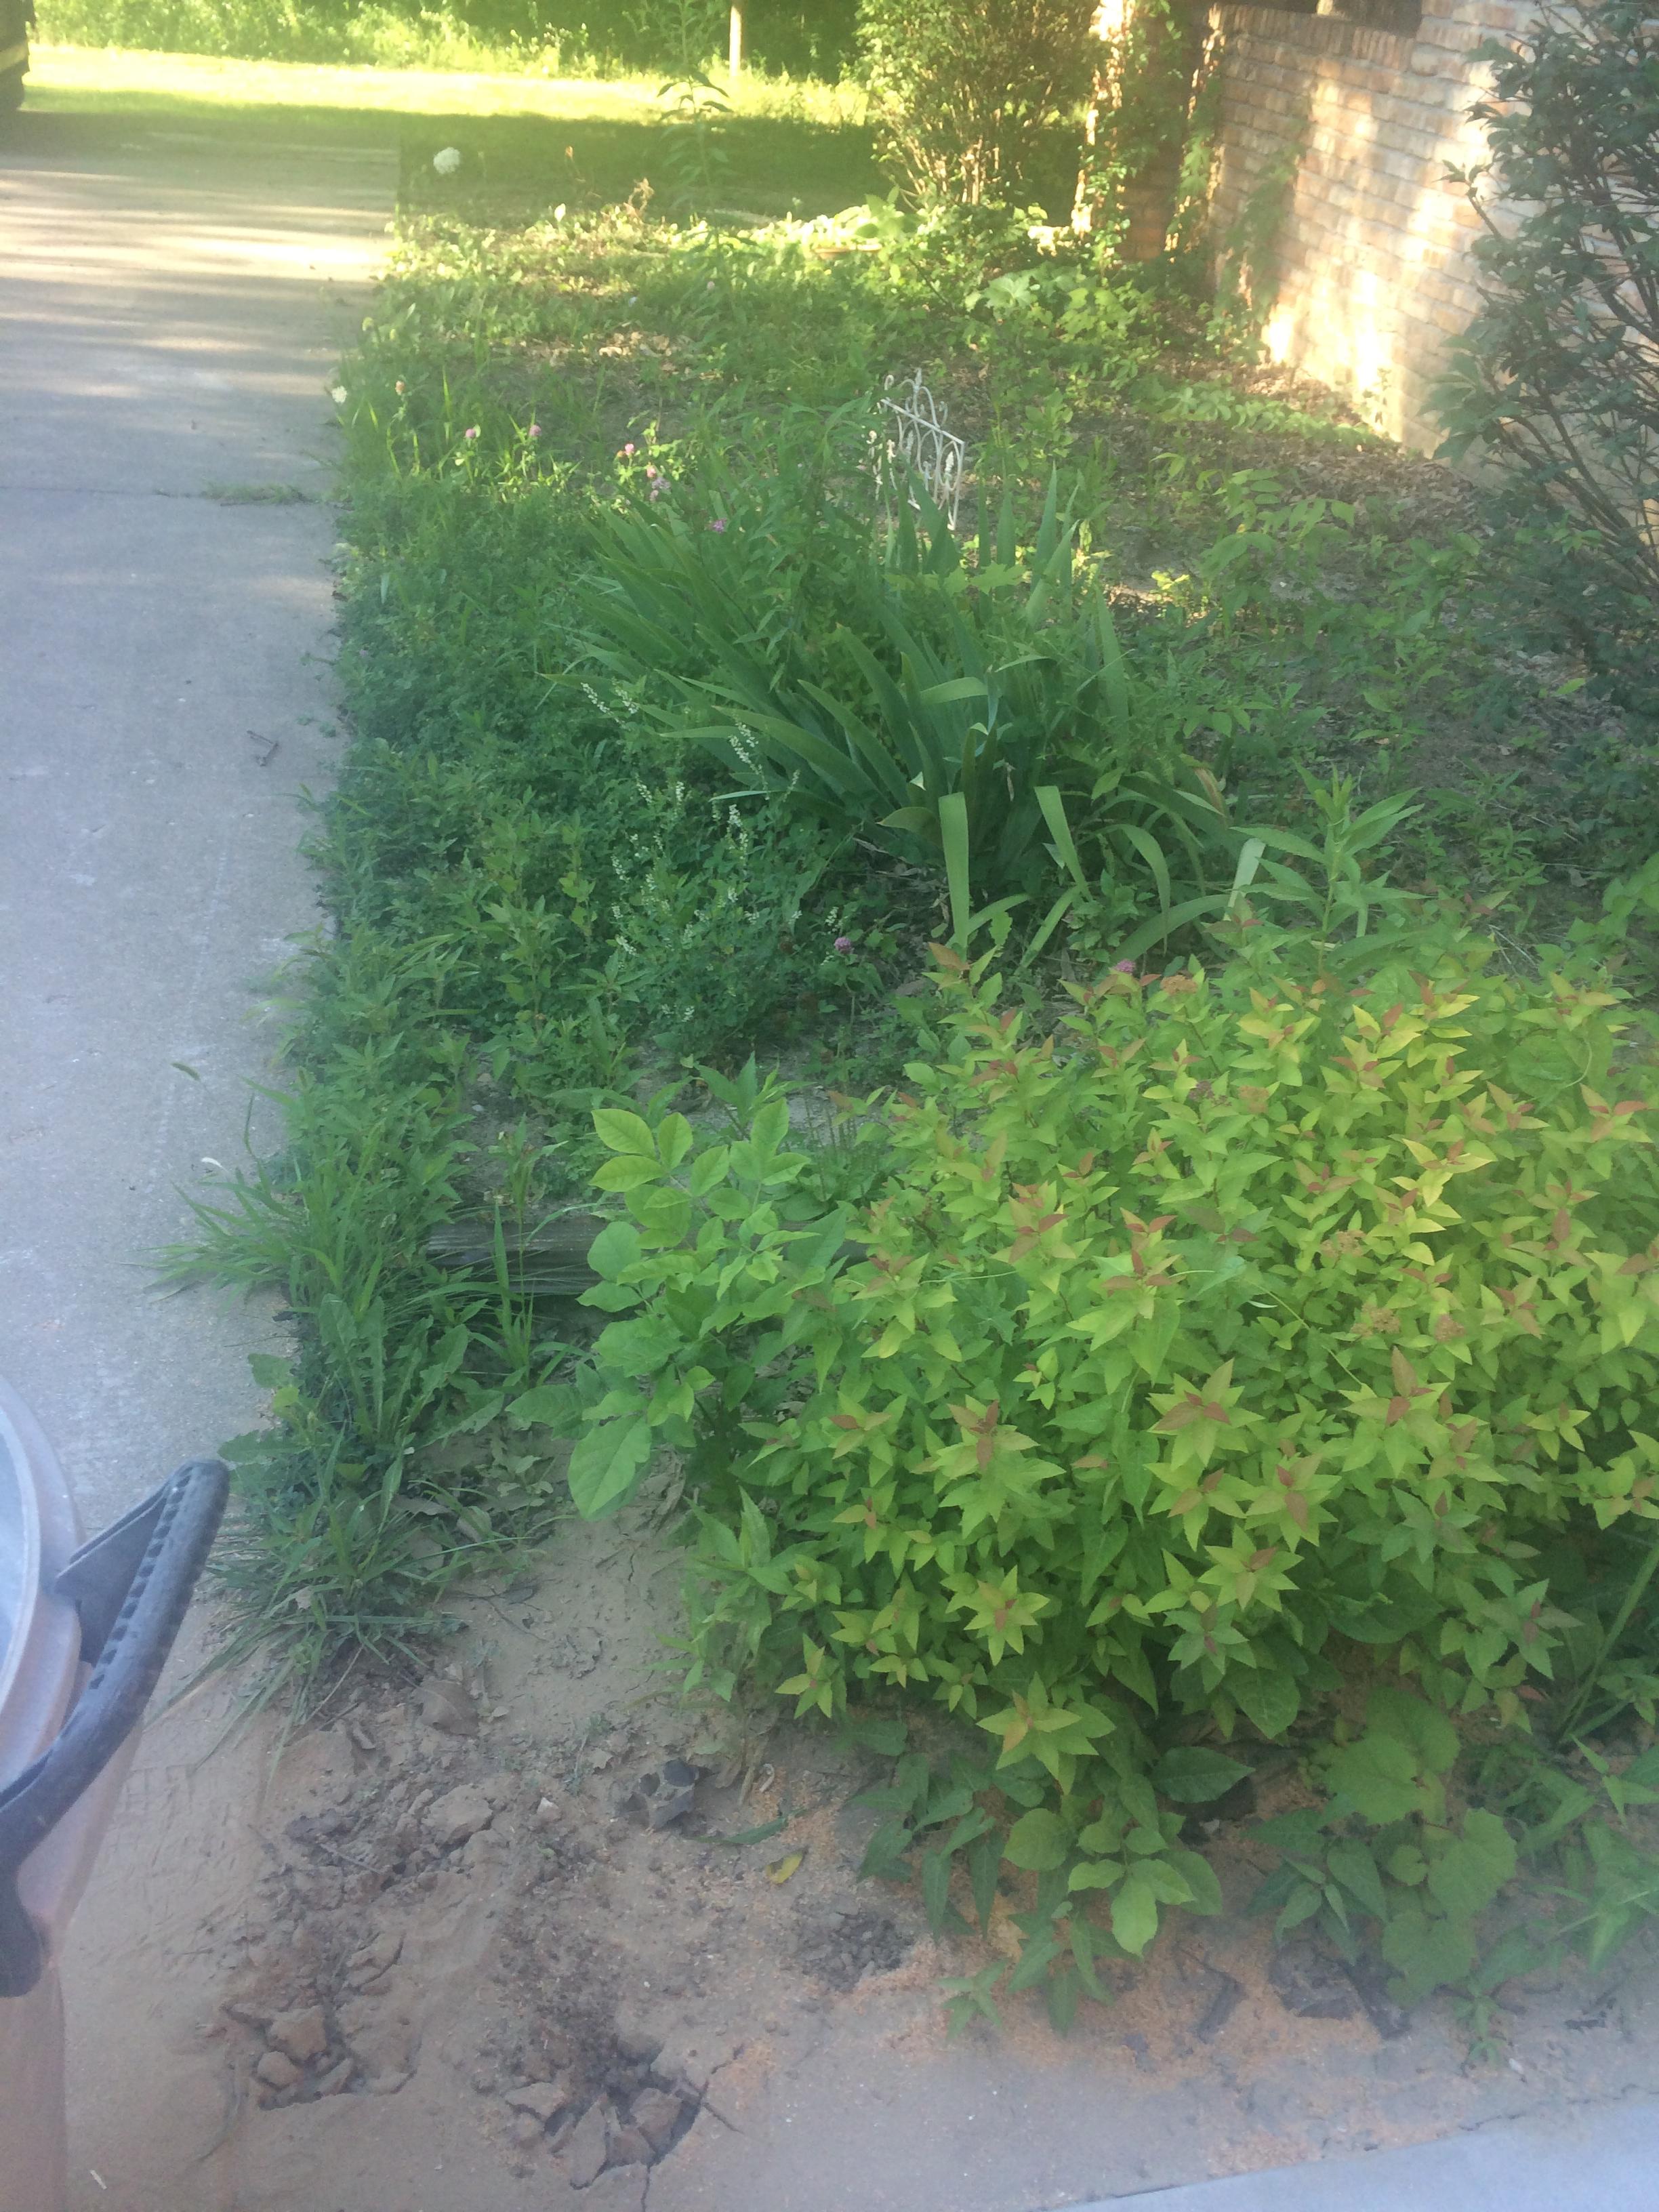 so many weeds!